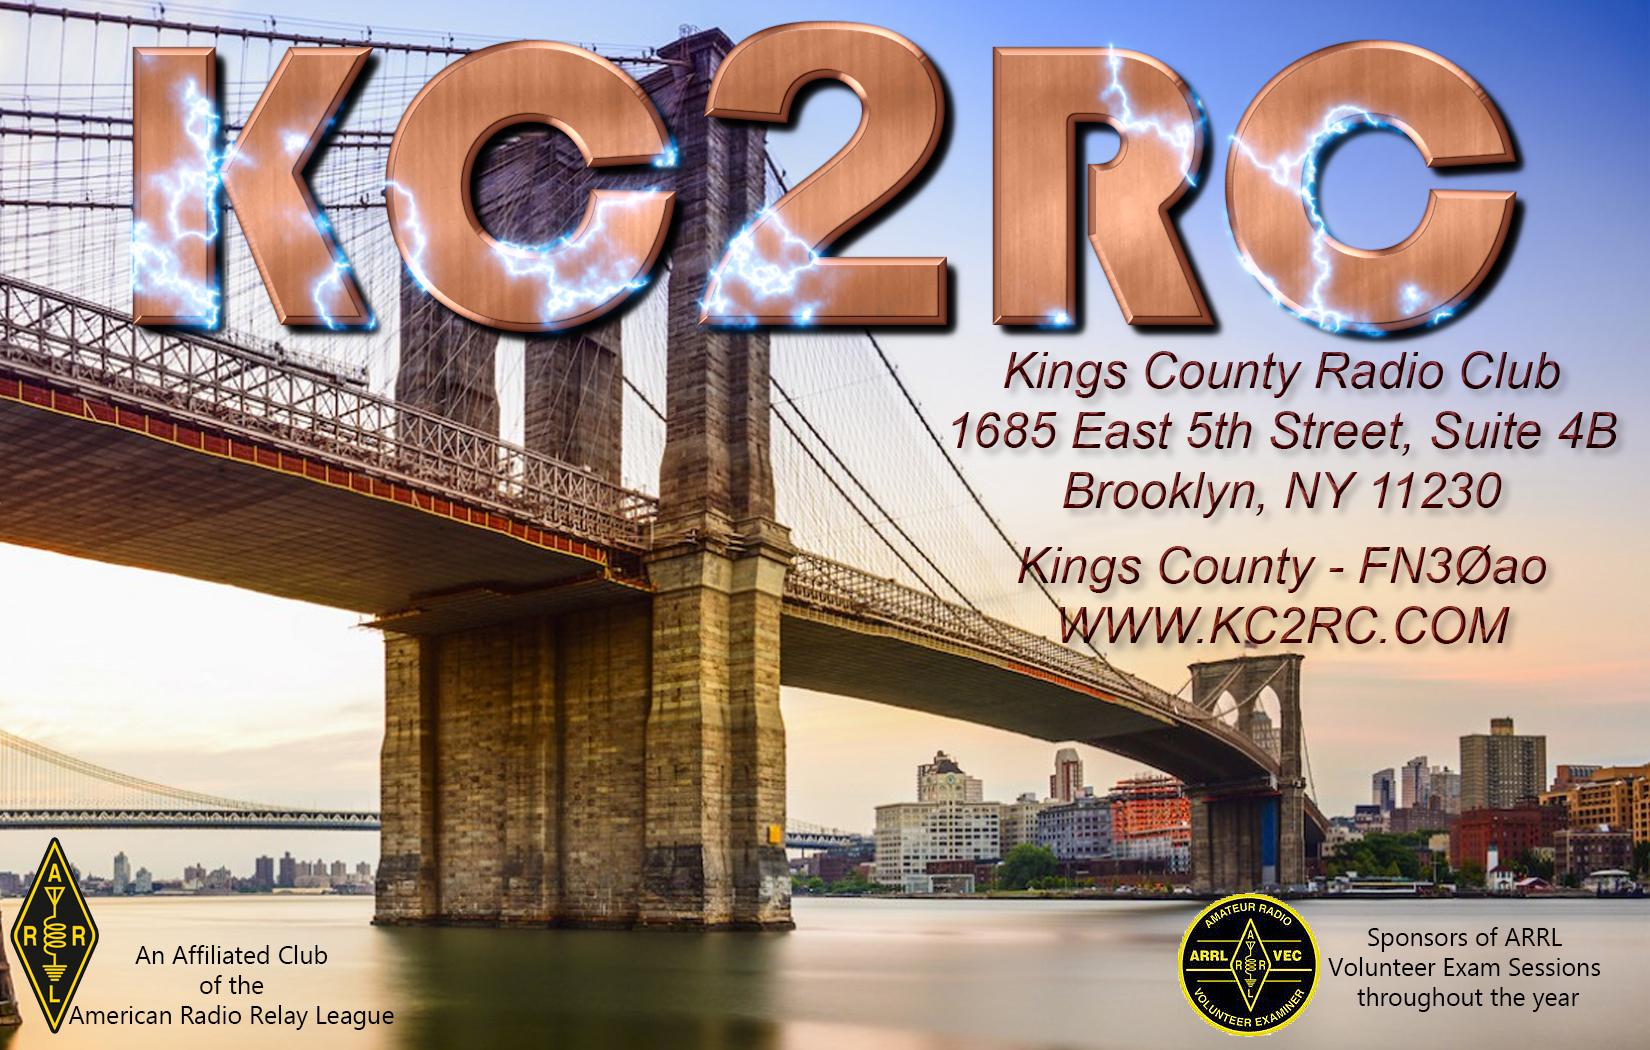 KC2RC QSL Card - 1bbbcp